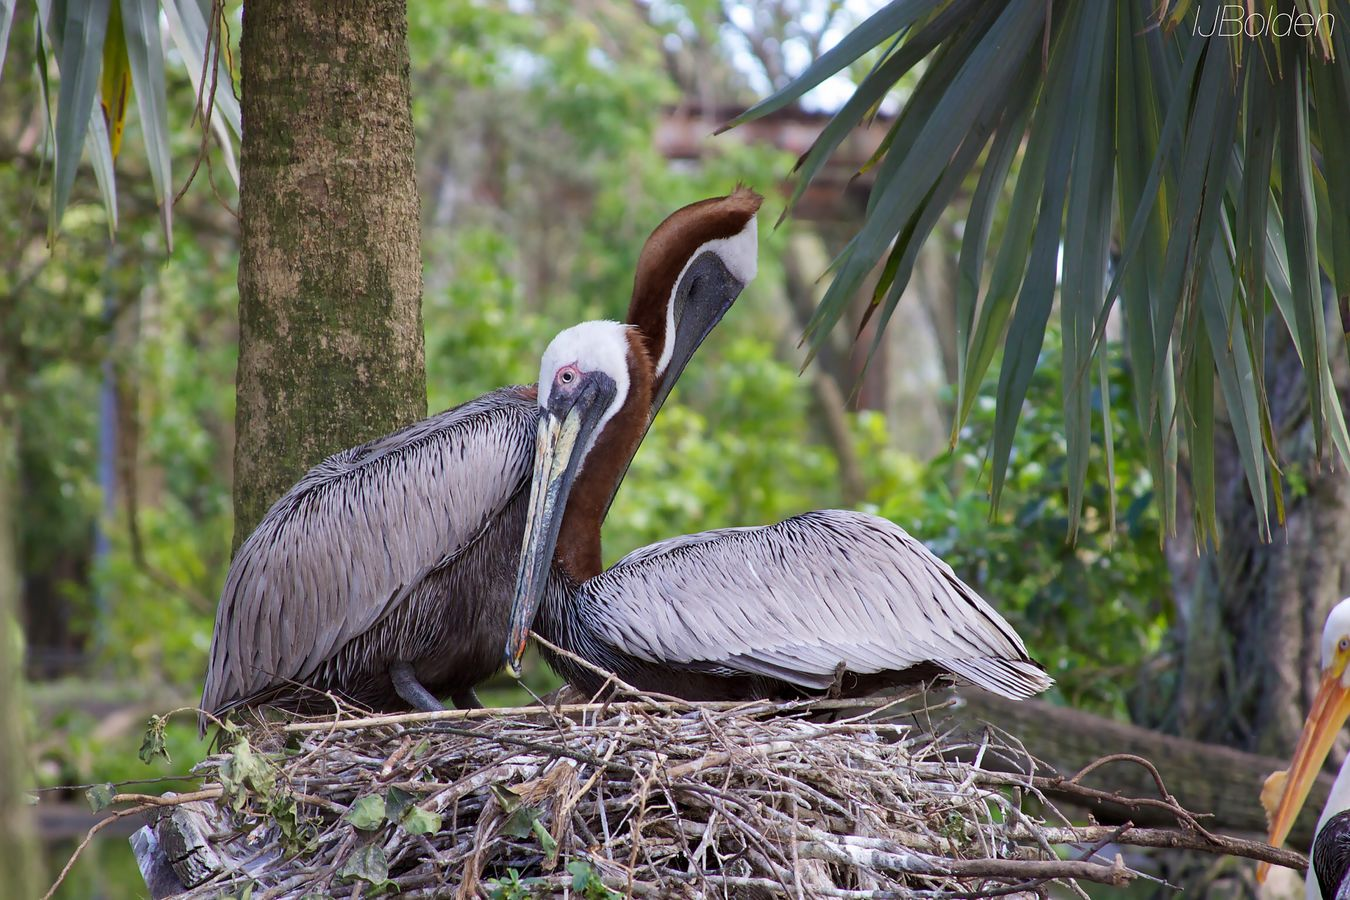 Love Birds Flamingo Gardens Florida Life The Moment - 2015 EyeEm Awards